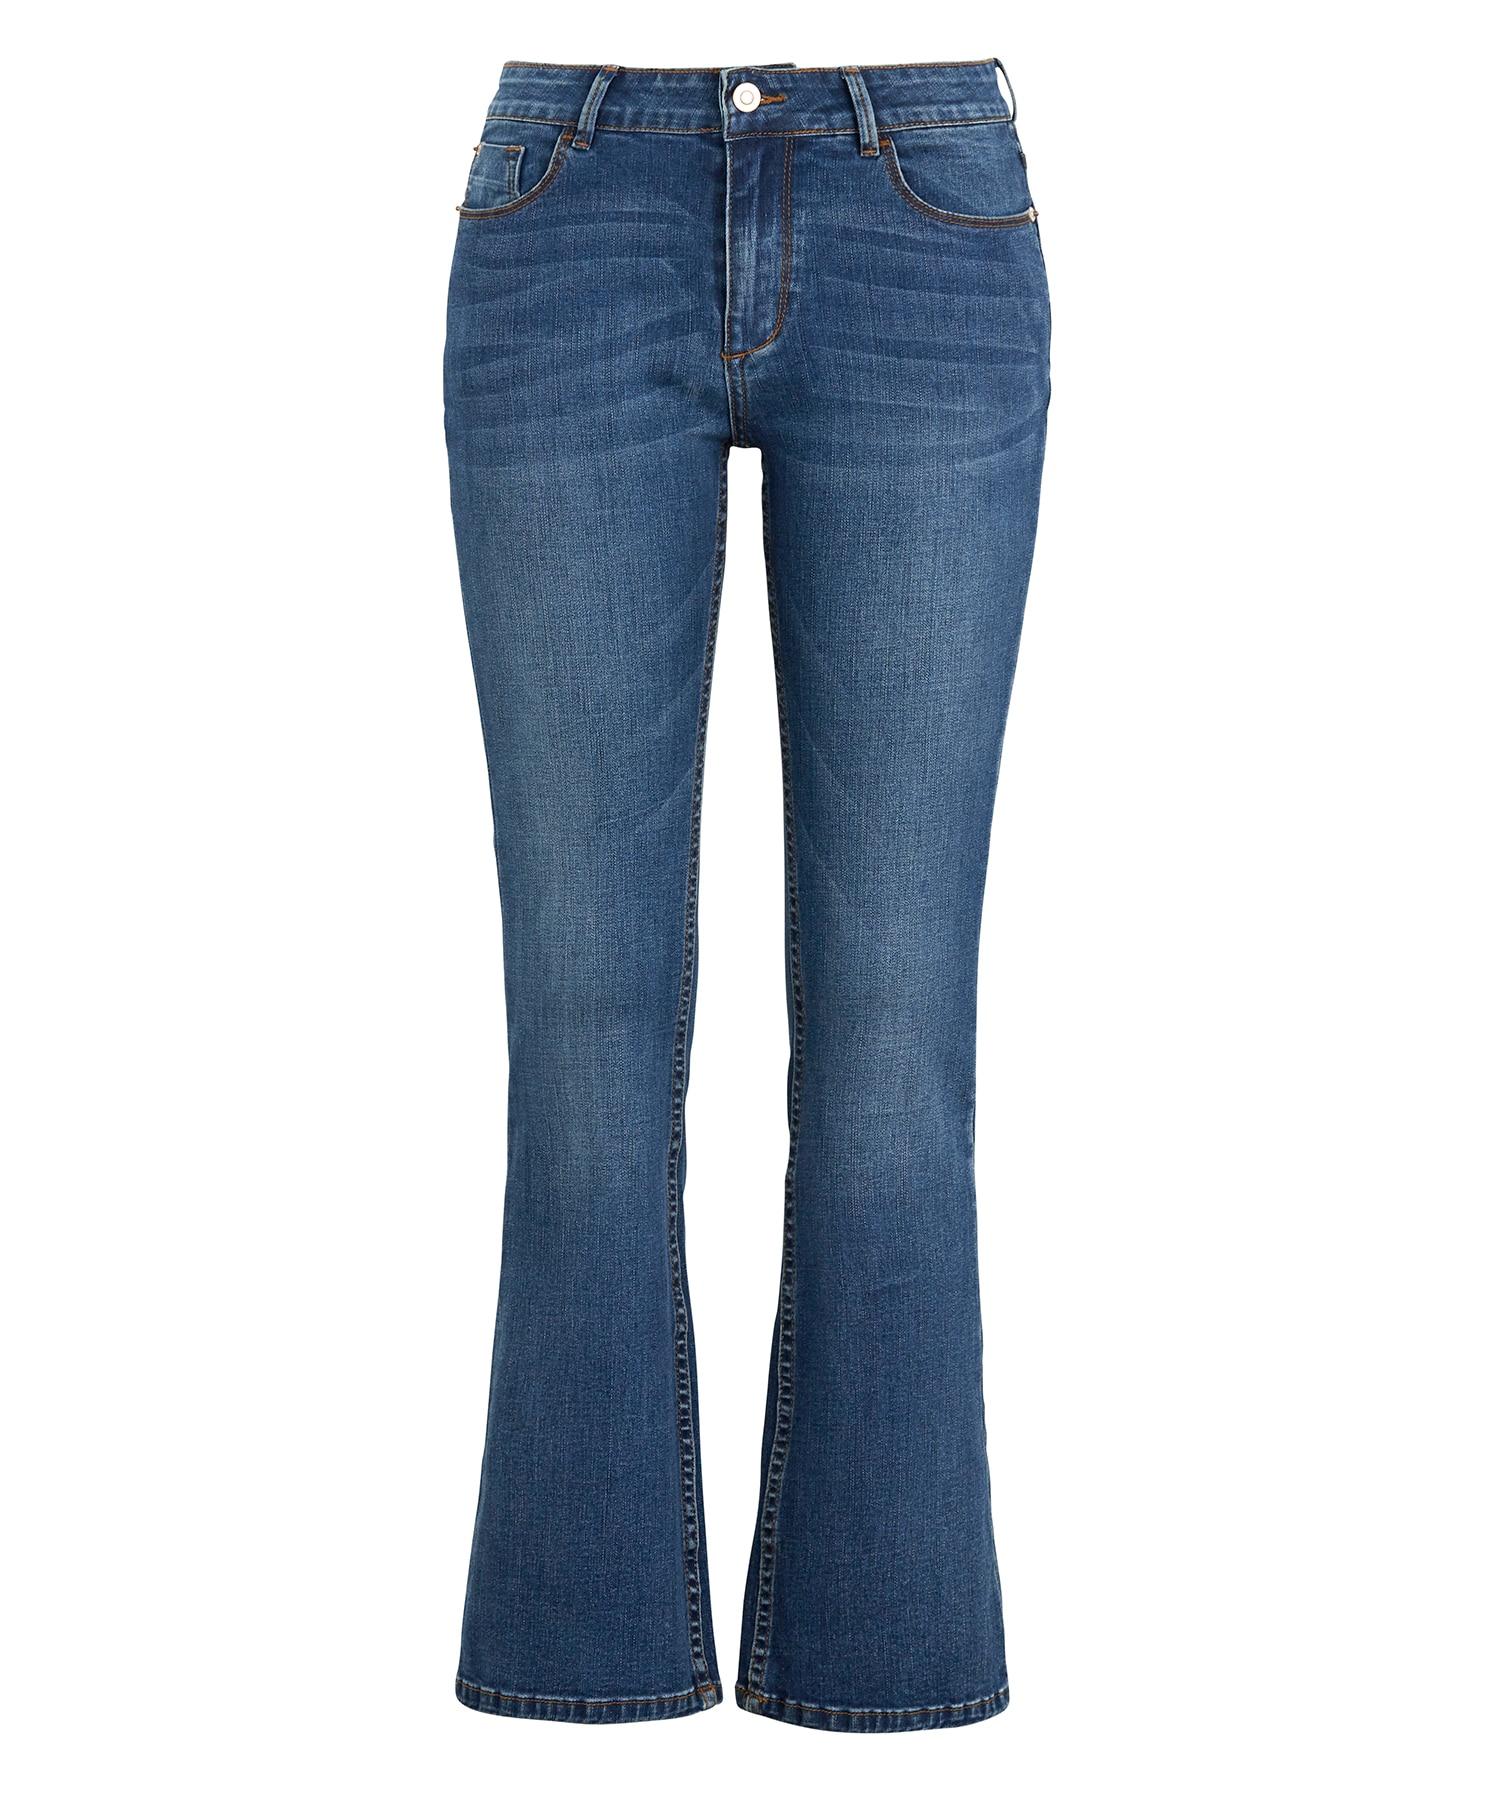 Redhill Regular jeans